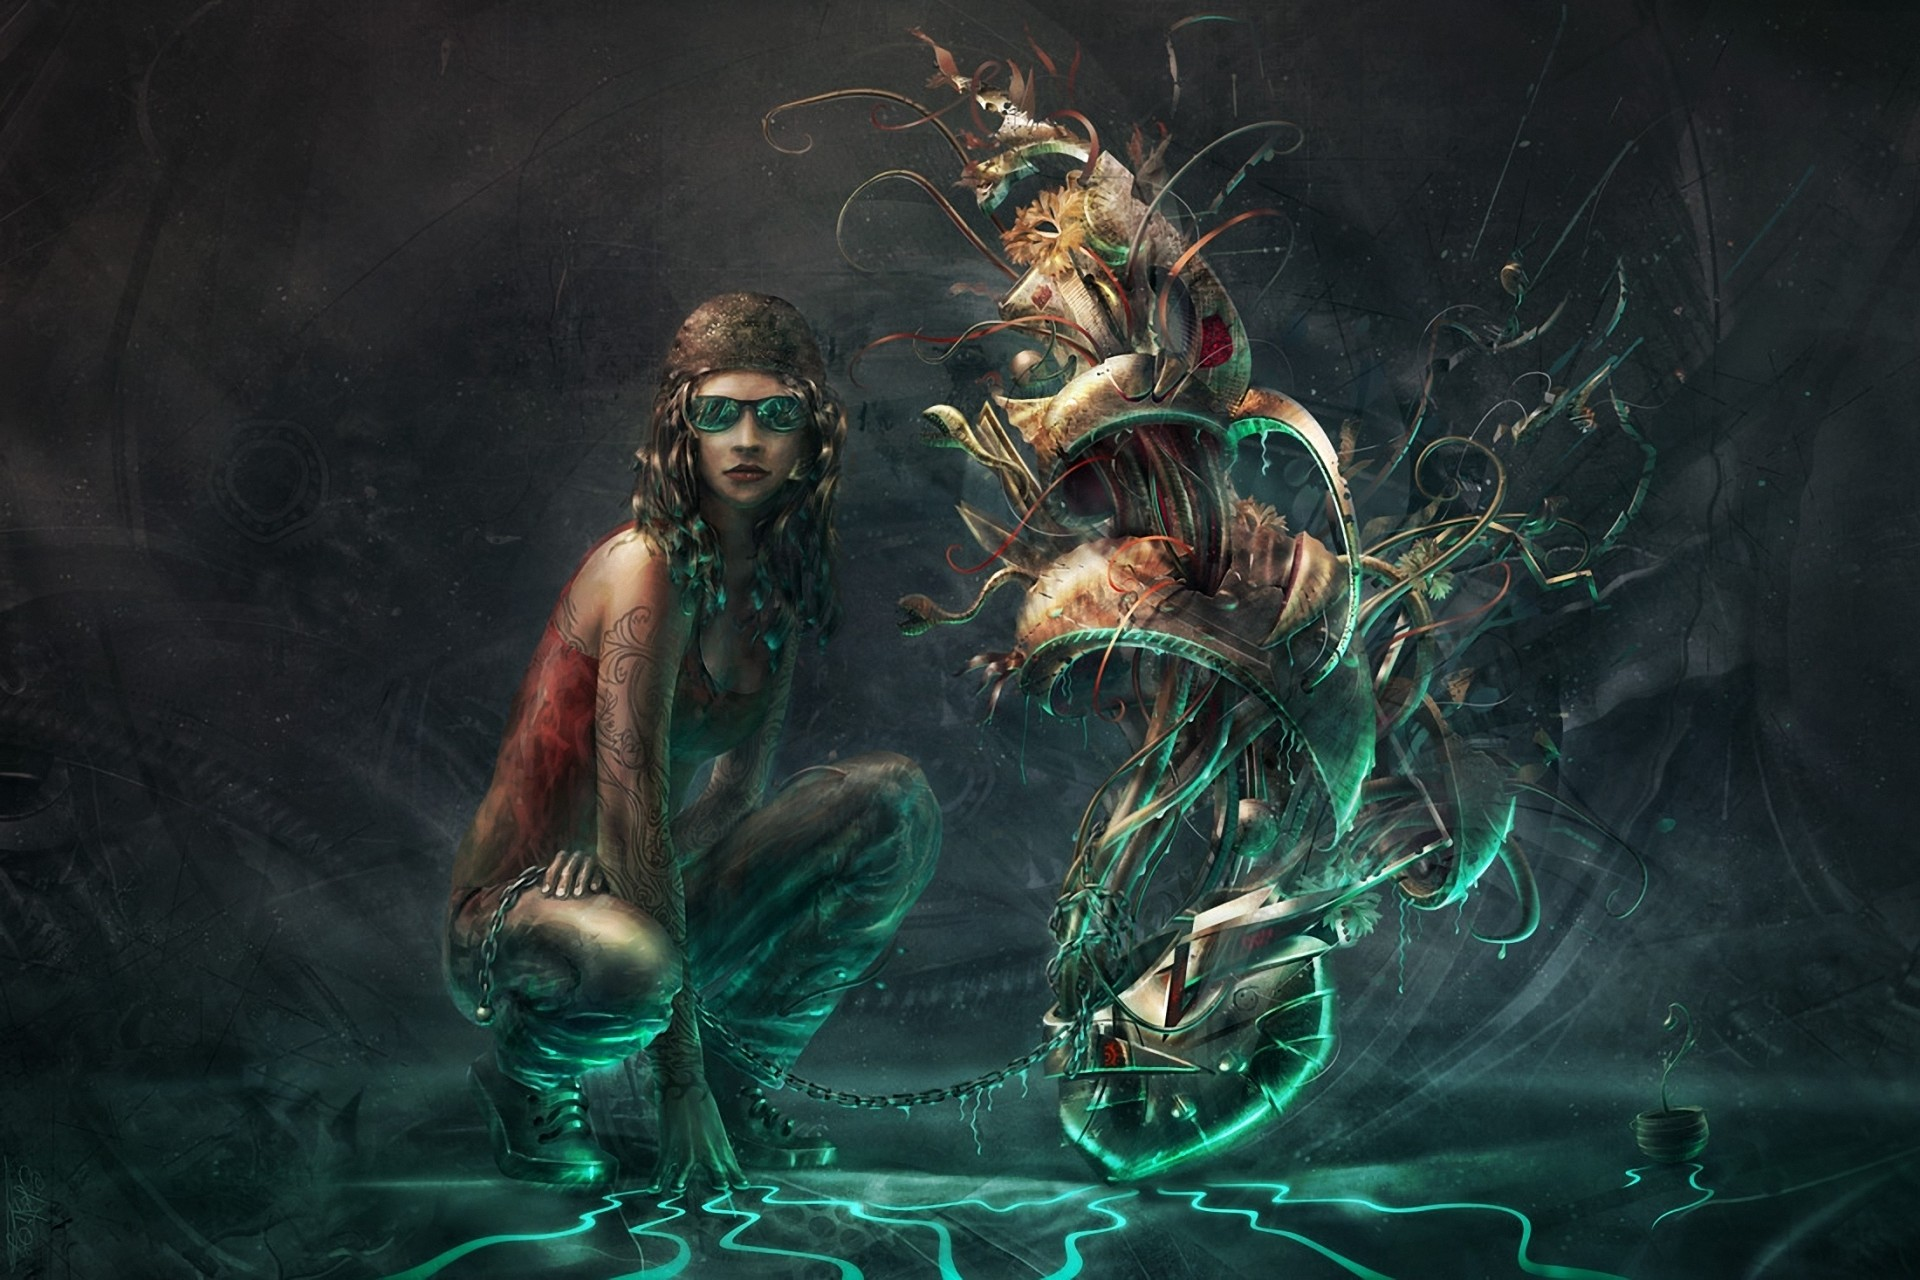 dark fantasy wallpaper hd (69+ images)